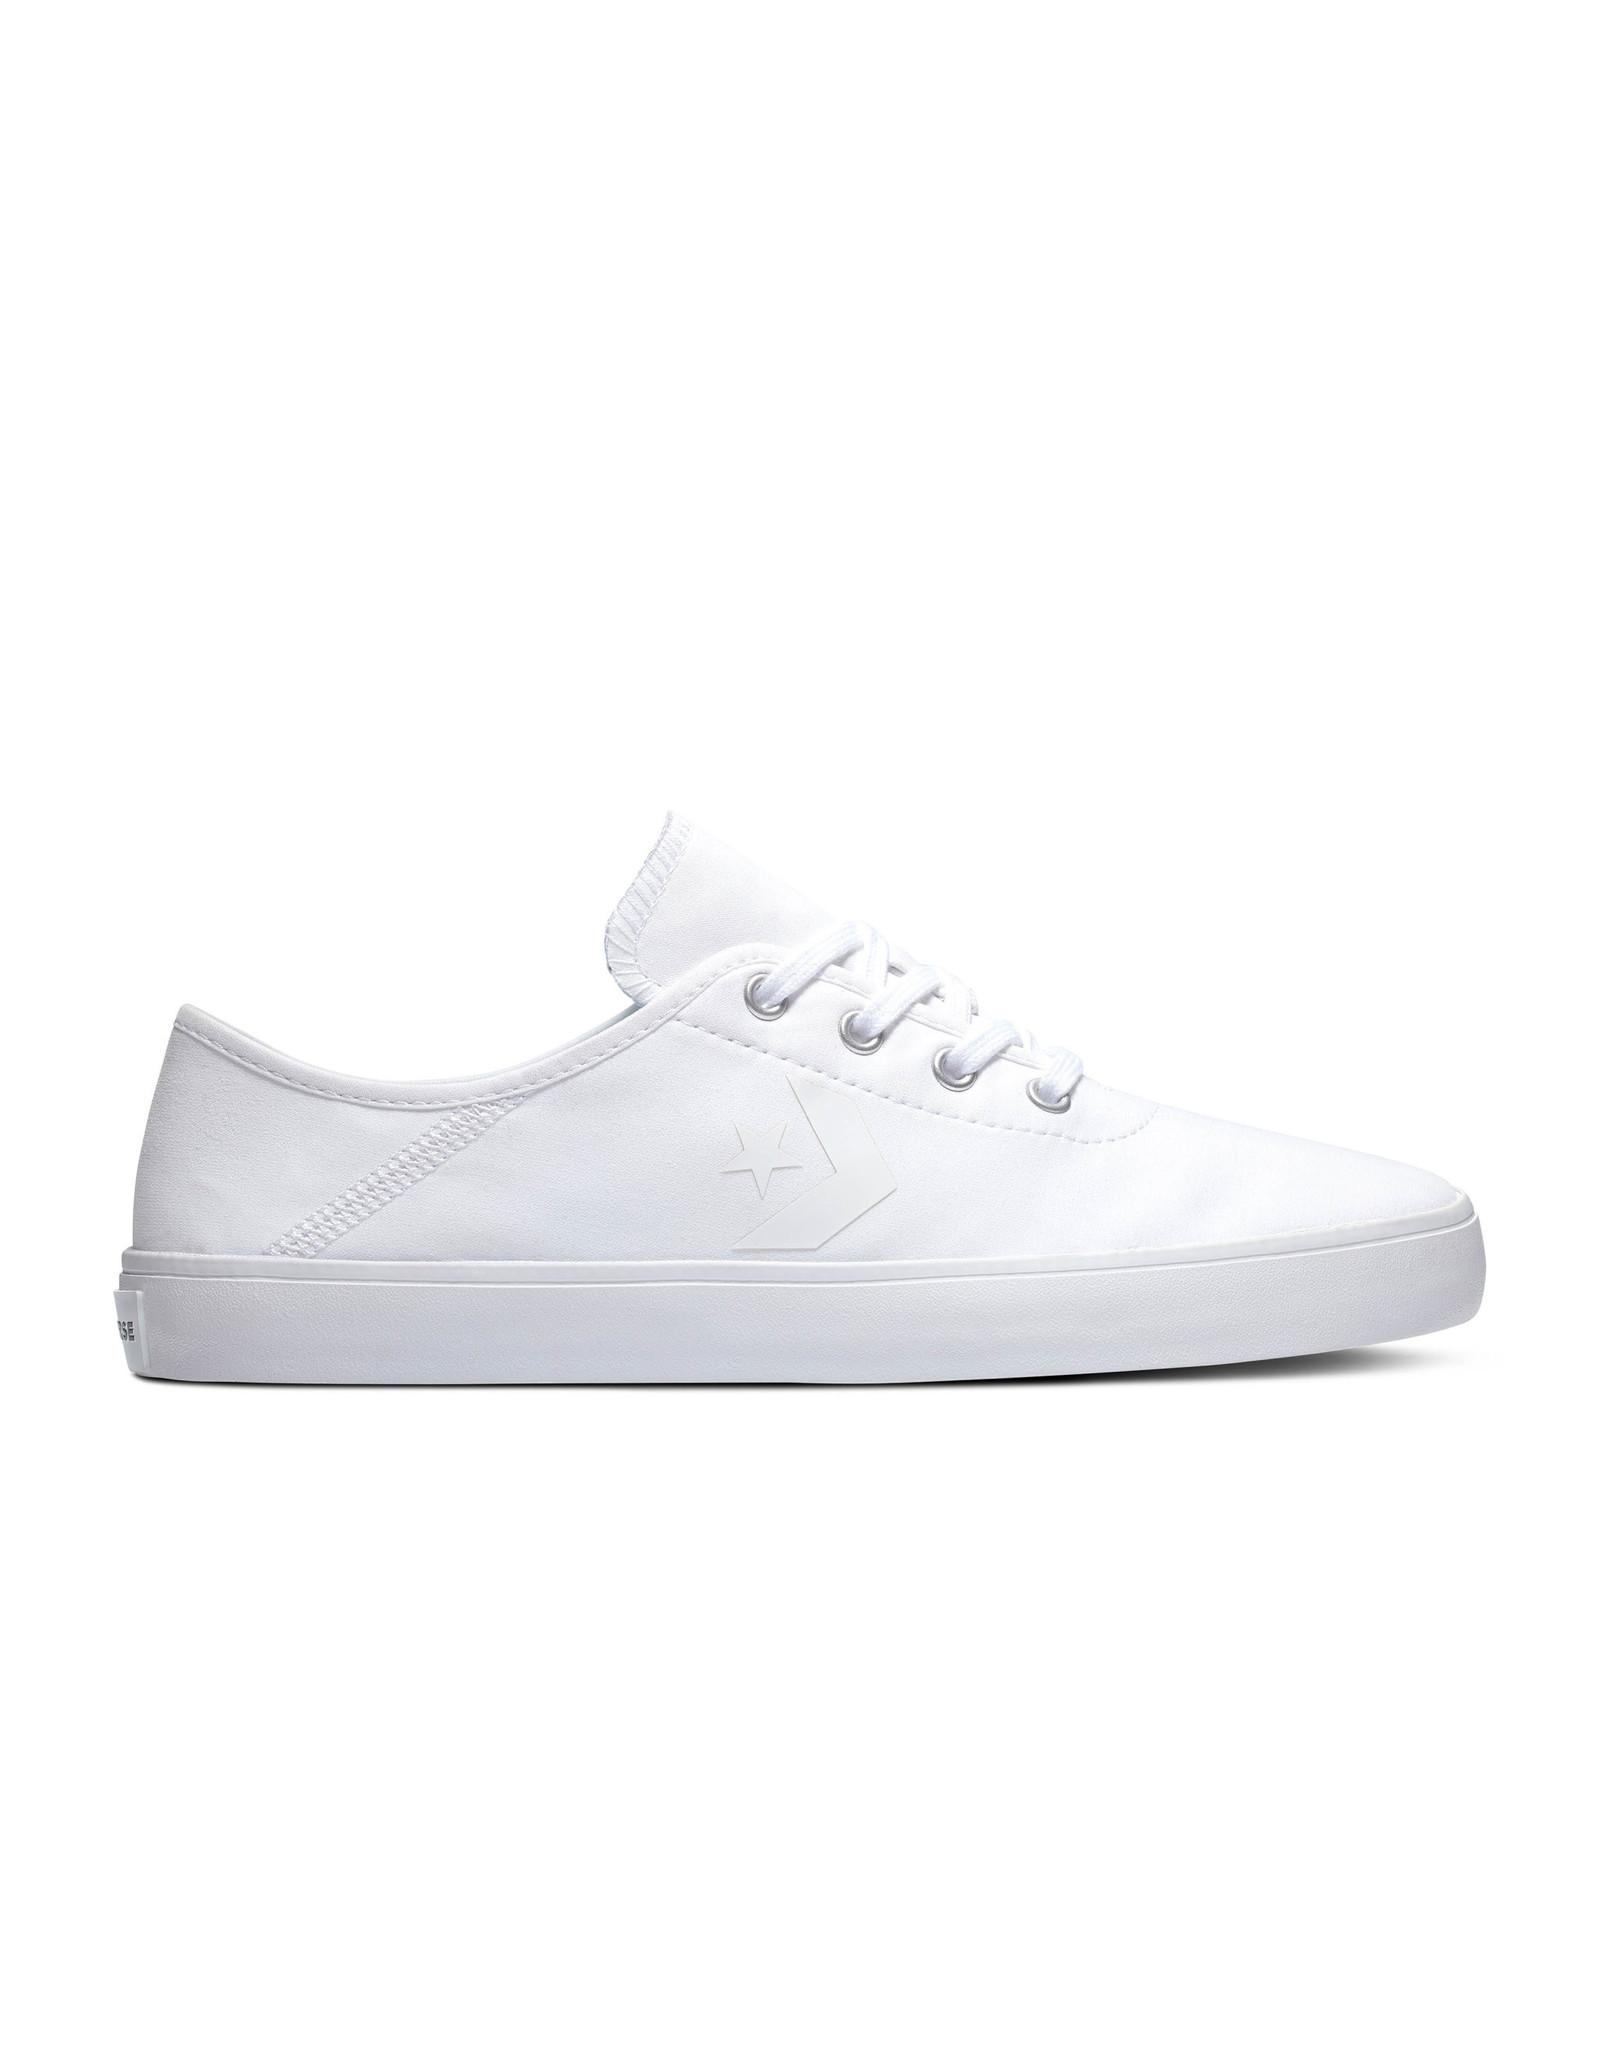 CONVERSE CONVERSE COSTA OX WHITE/WHITE/WHITE C072W-563435C